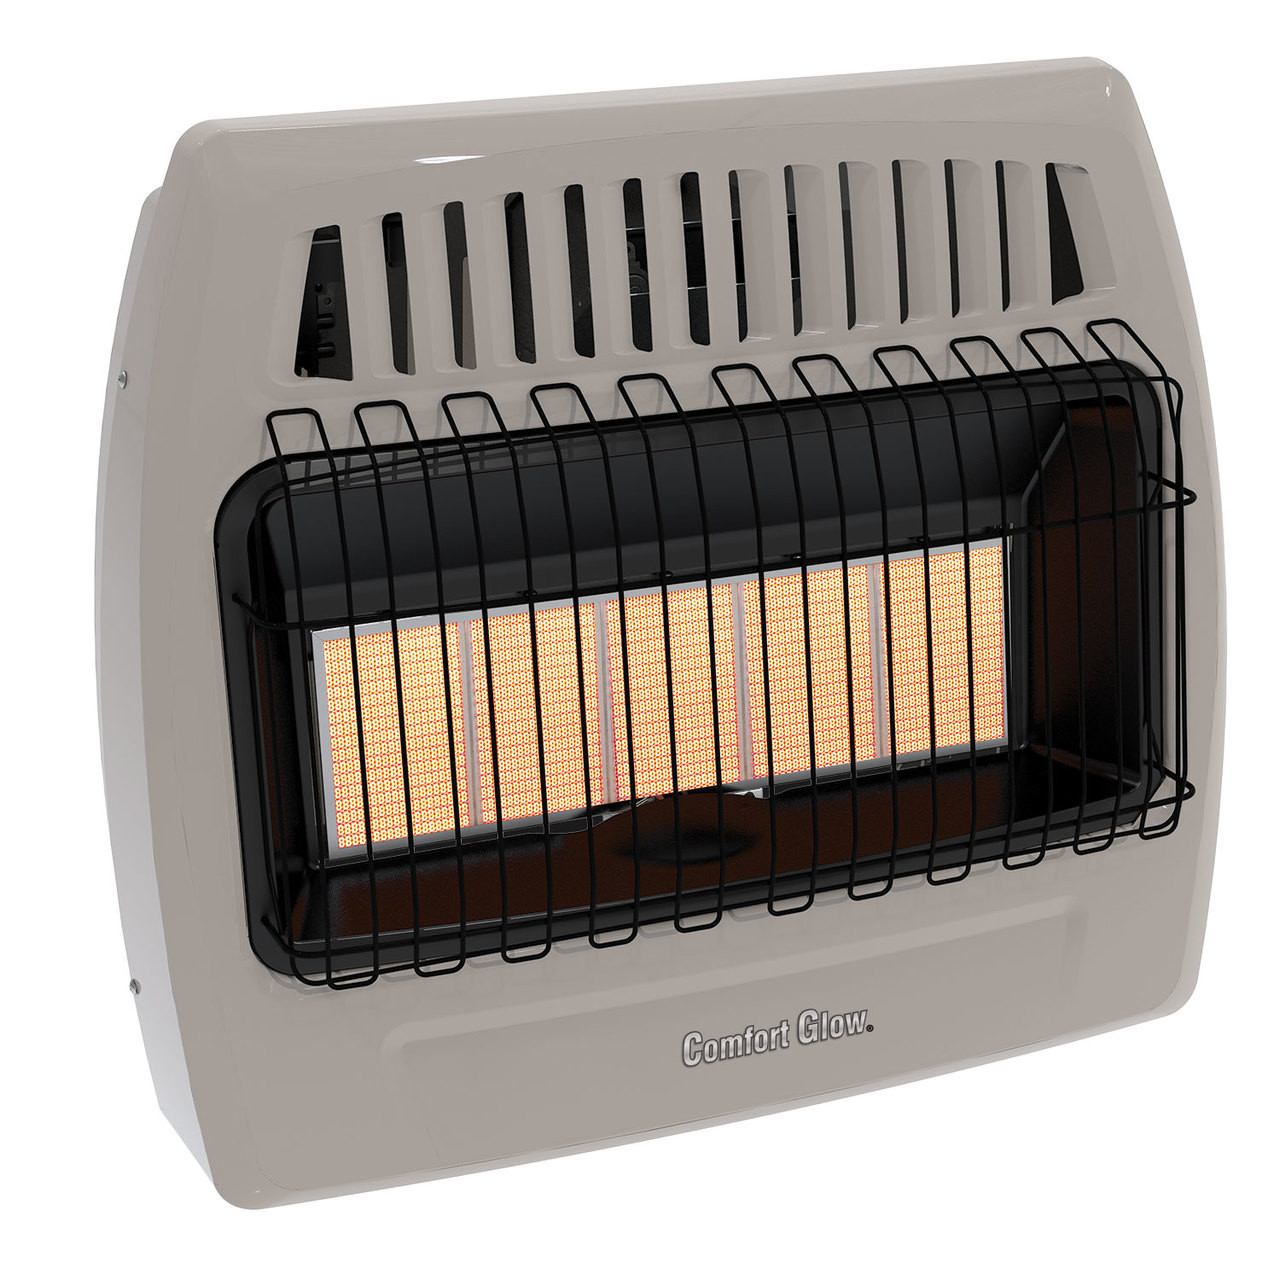 Comfort Glow Propane Heater Facias